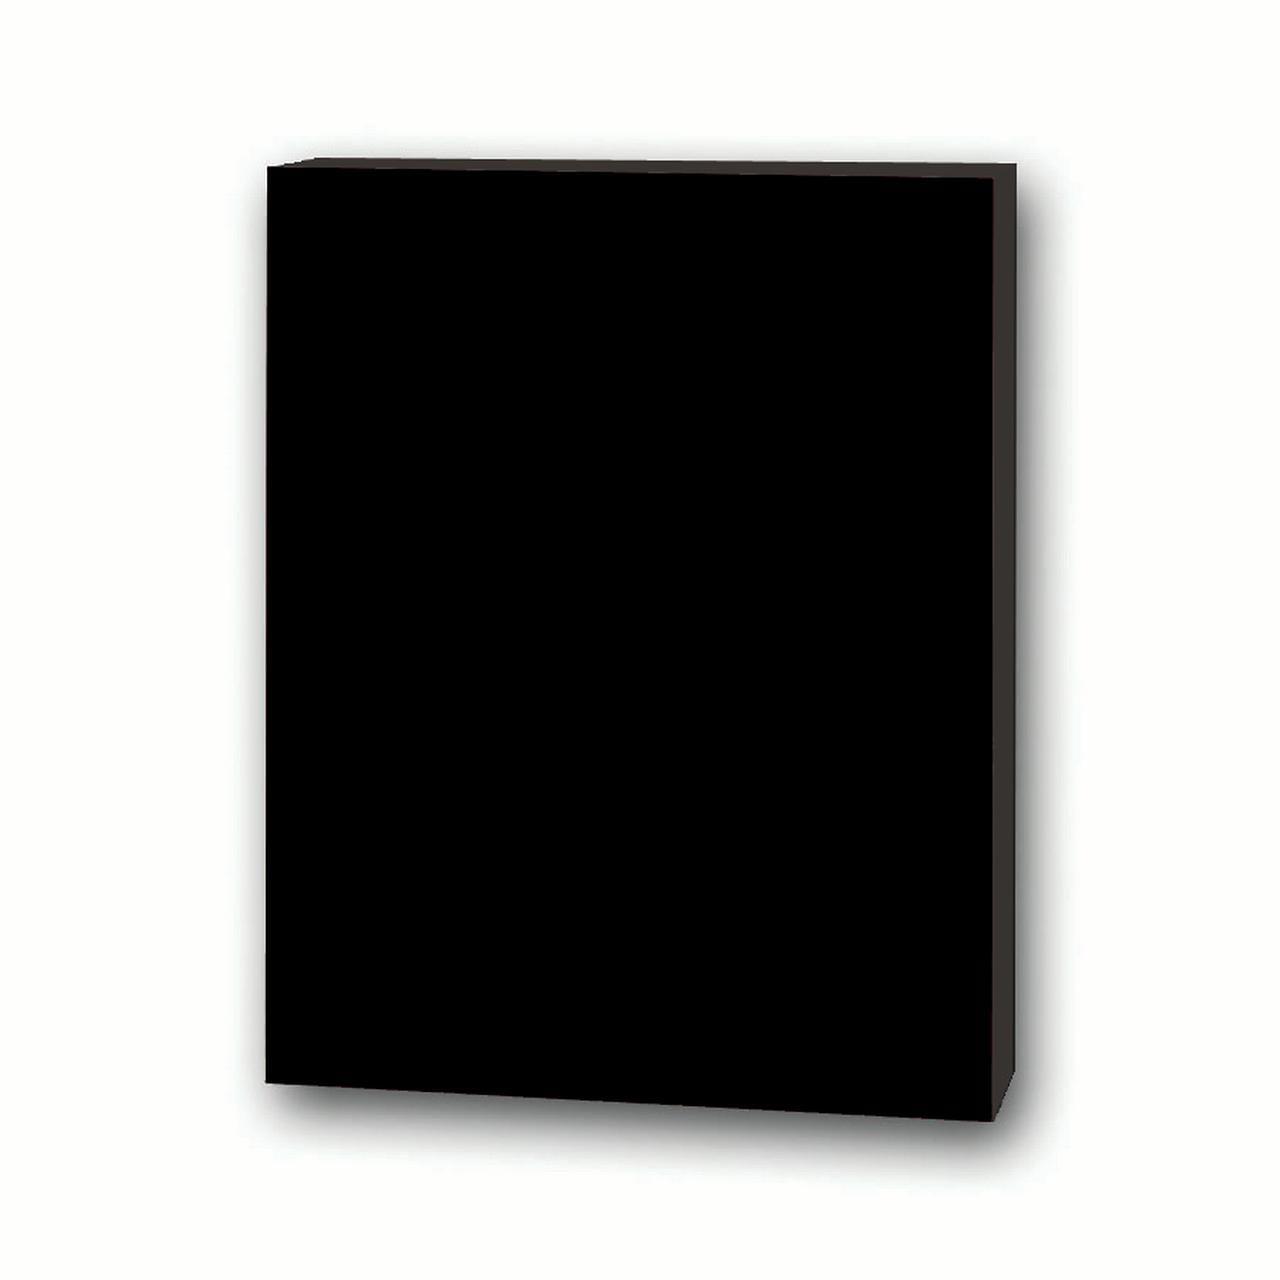 "20"" X 30"" 3 16 Total Black Foam Board 25 Pack by Flipside Products"